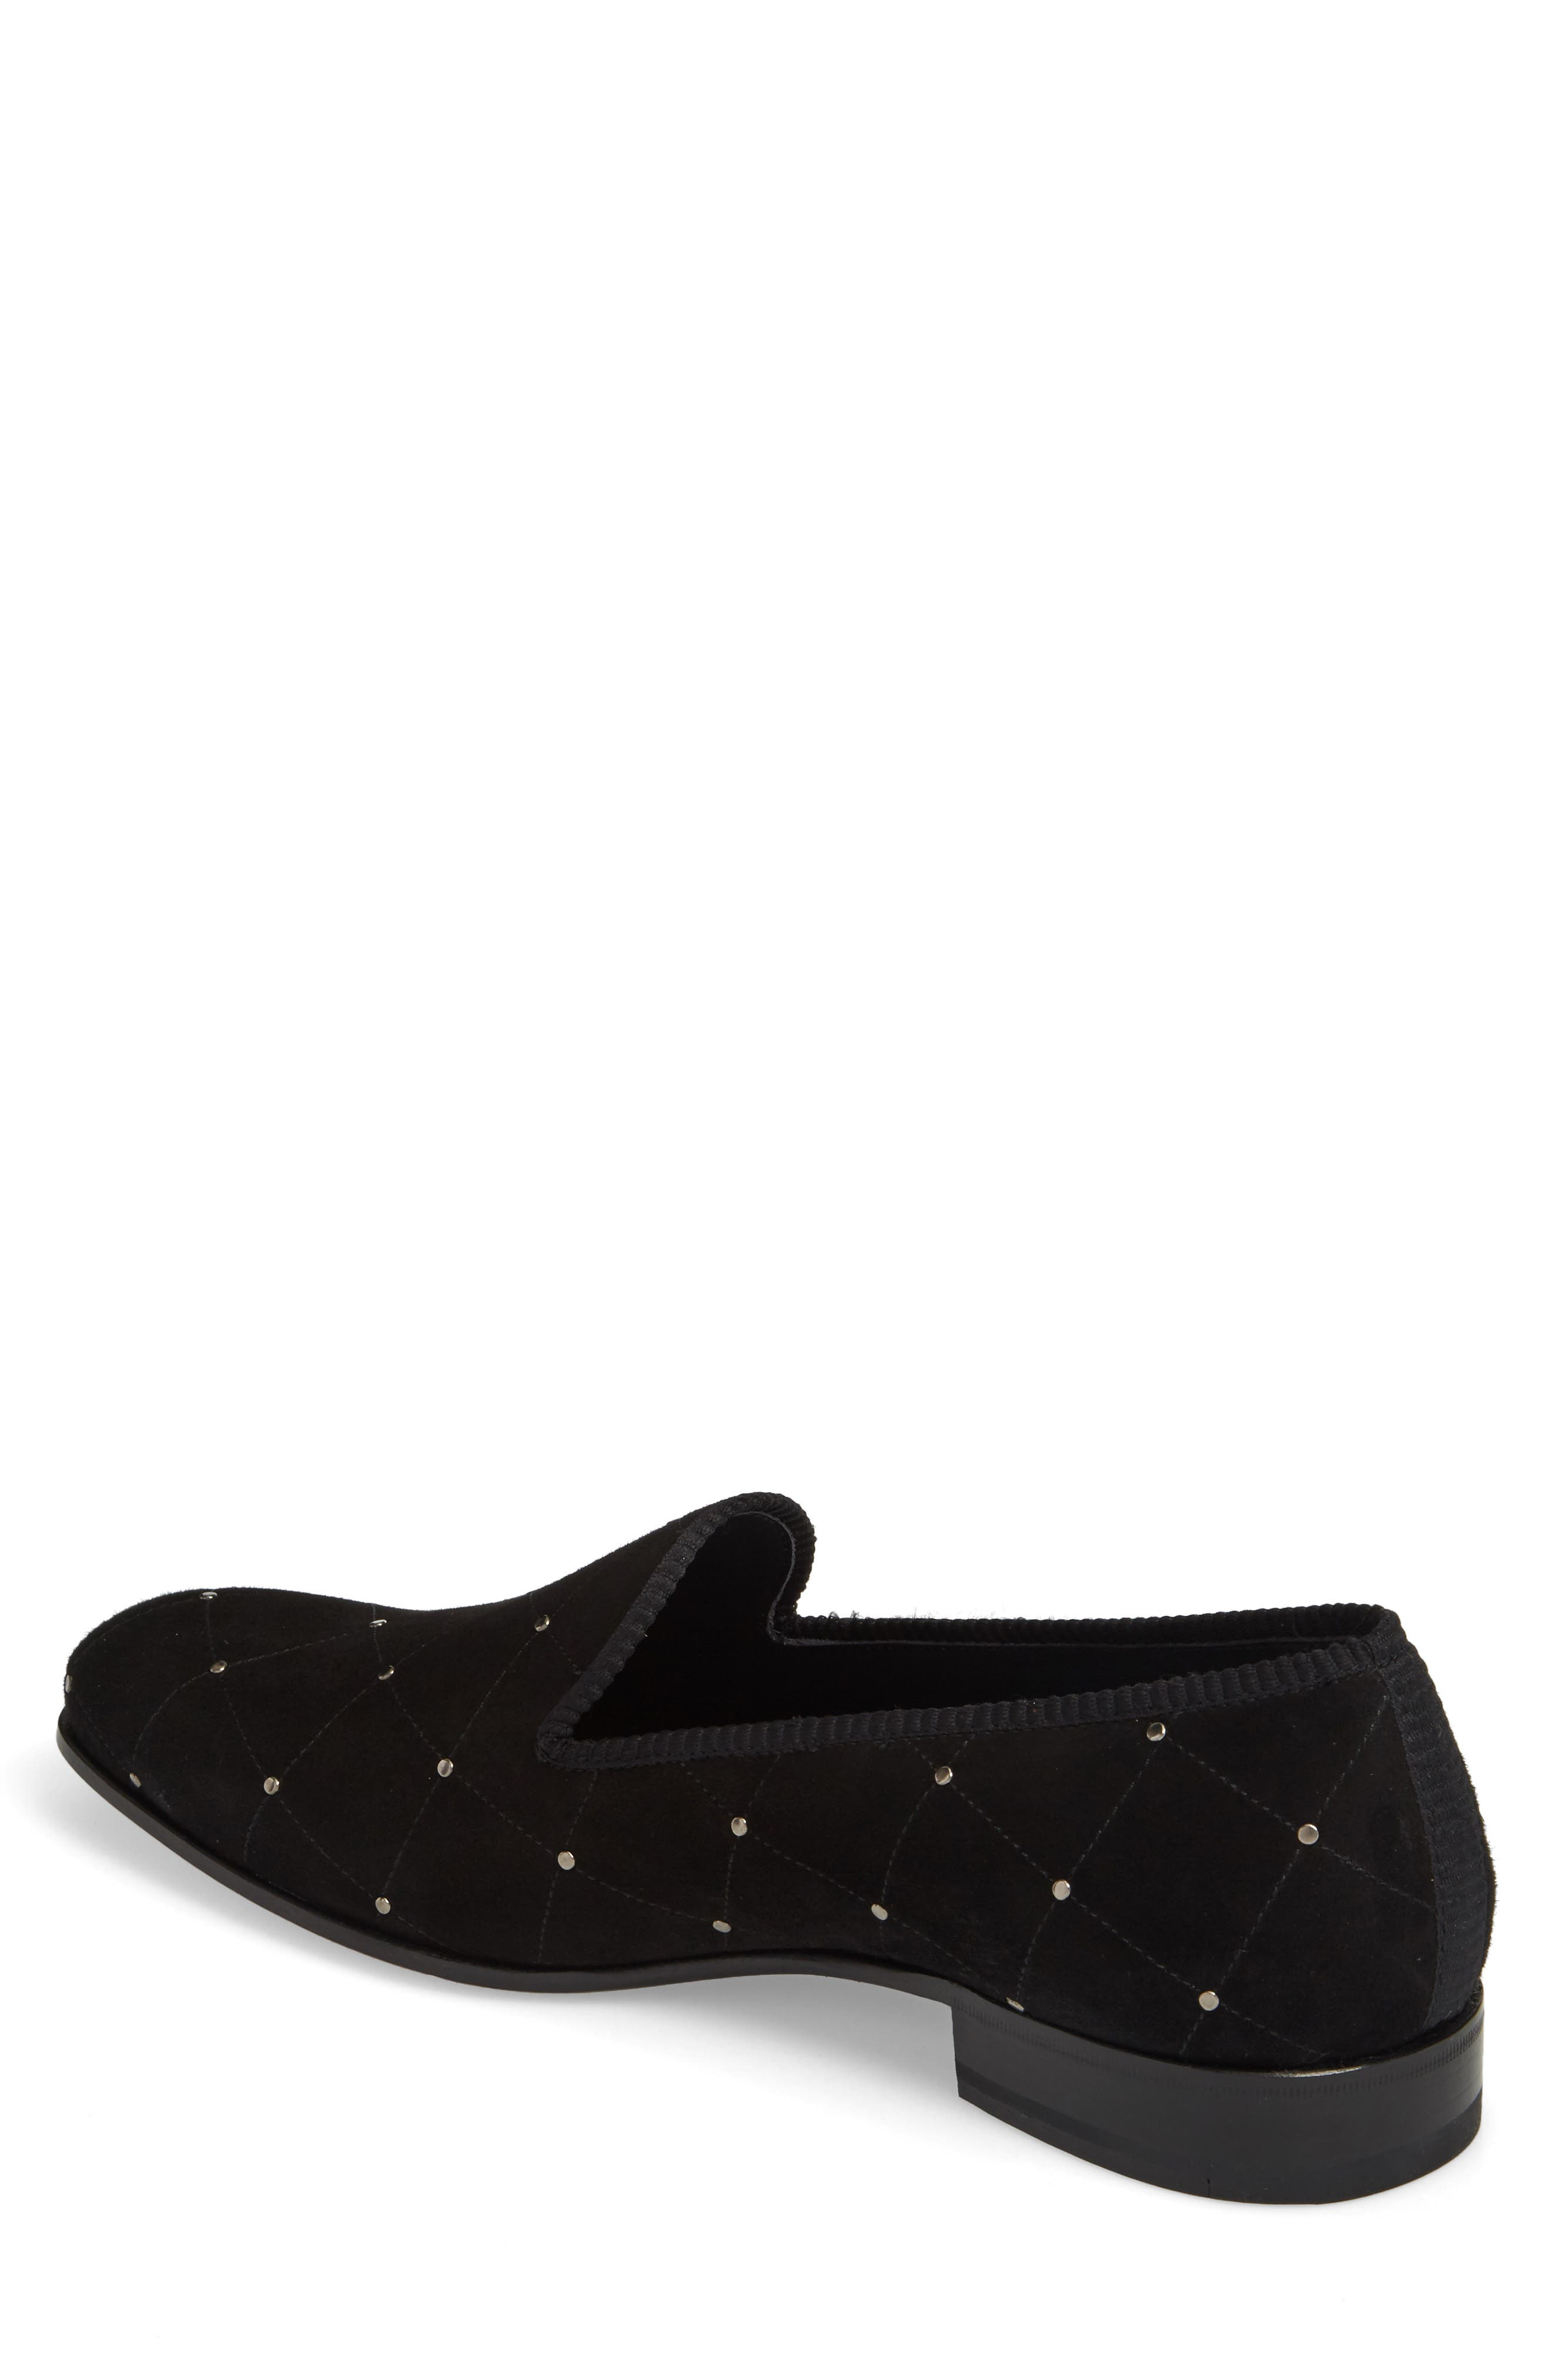 Talo Studded Venetian Loafer,                             Alternate thumbnail 2, color,                             BLACK SUEDE